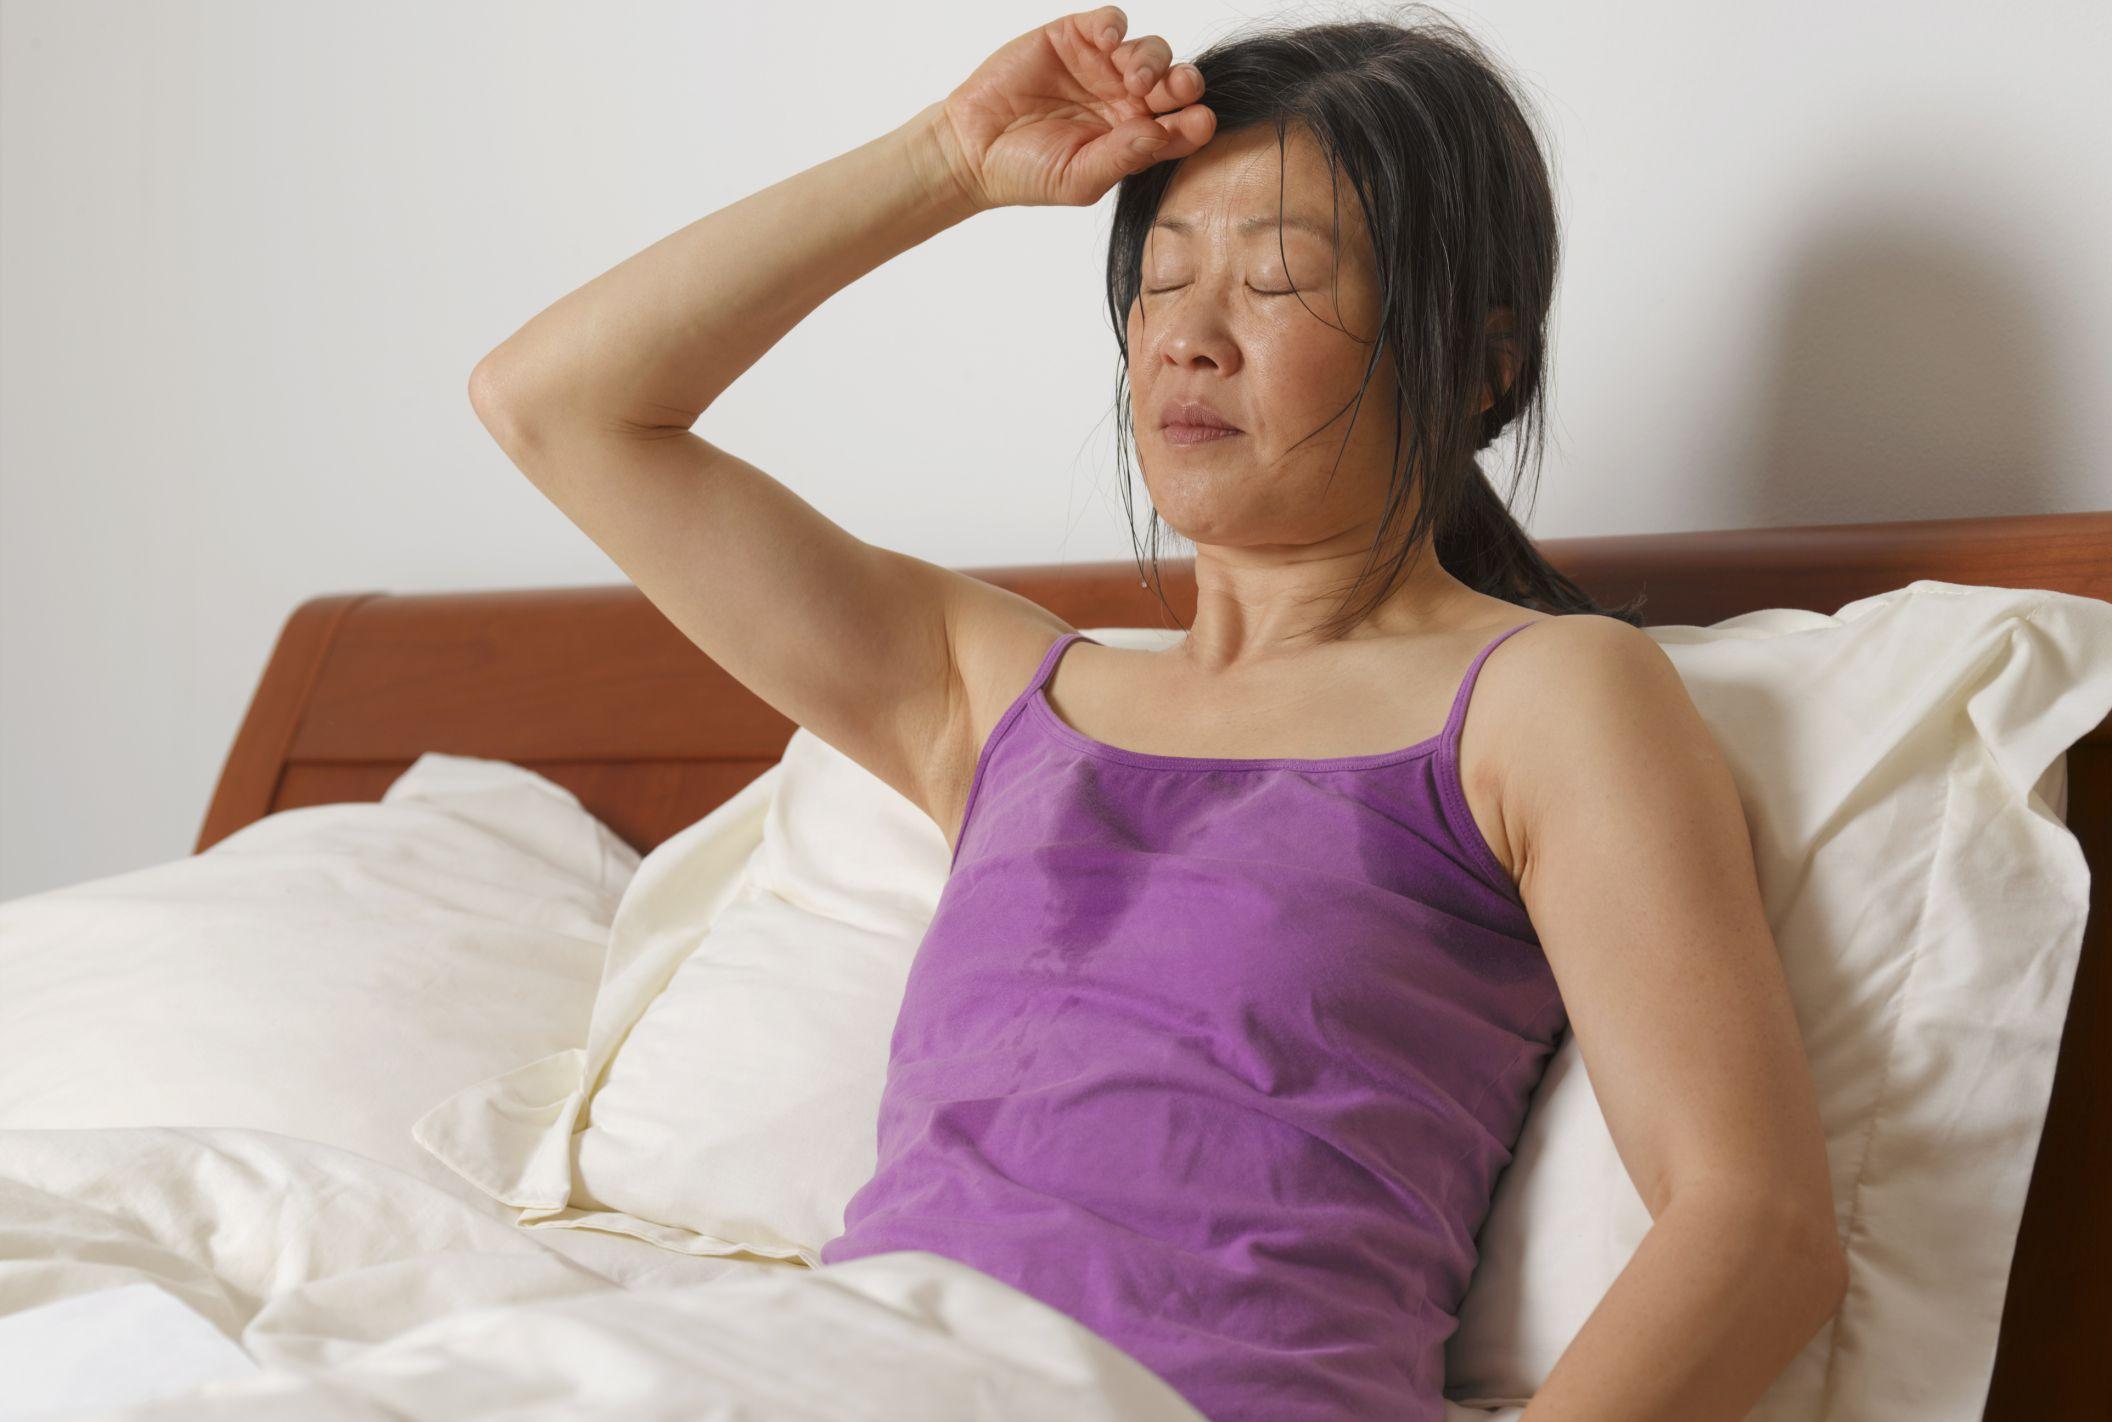 Common Causes of Night Sweats